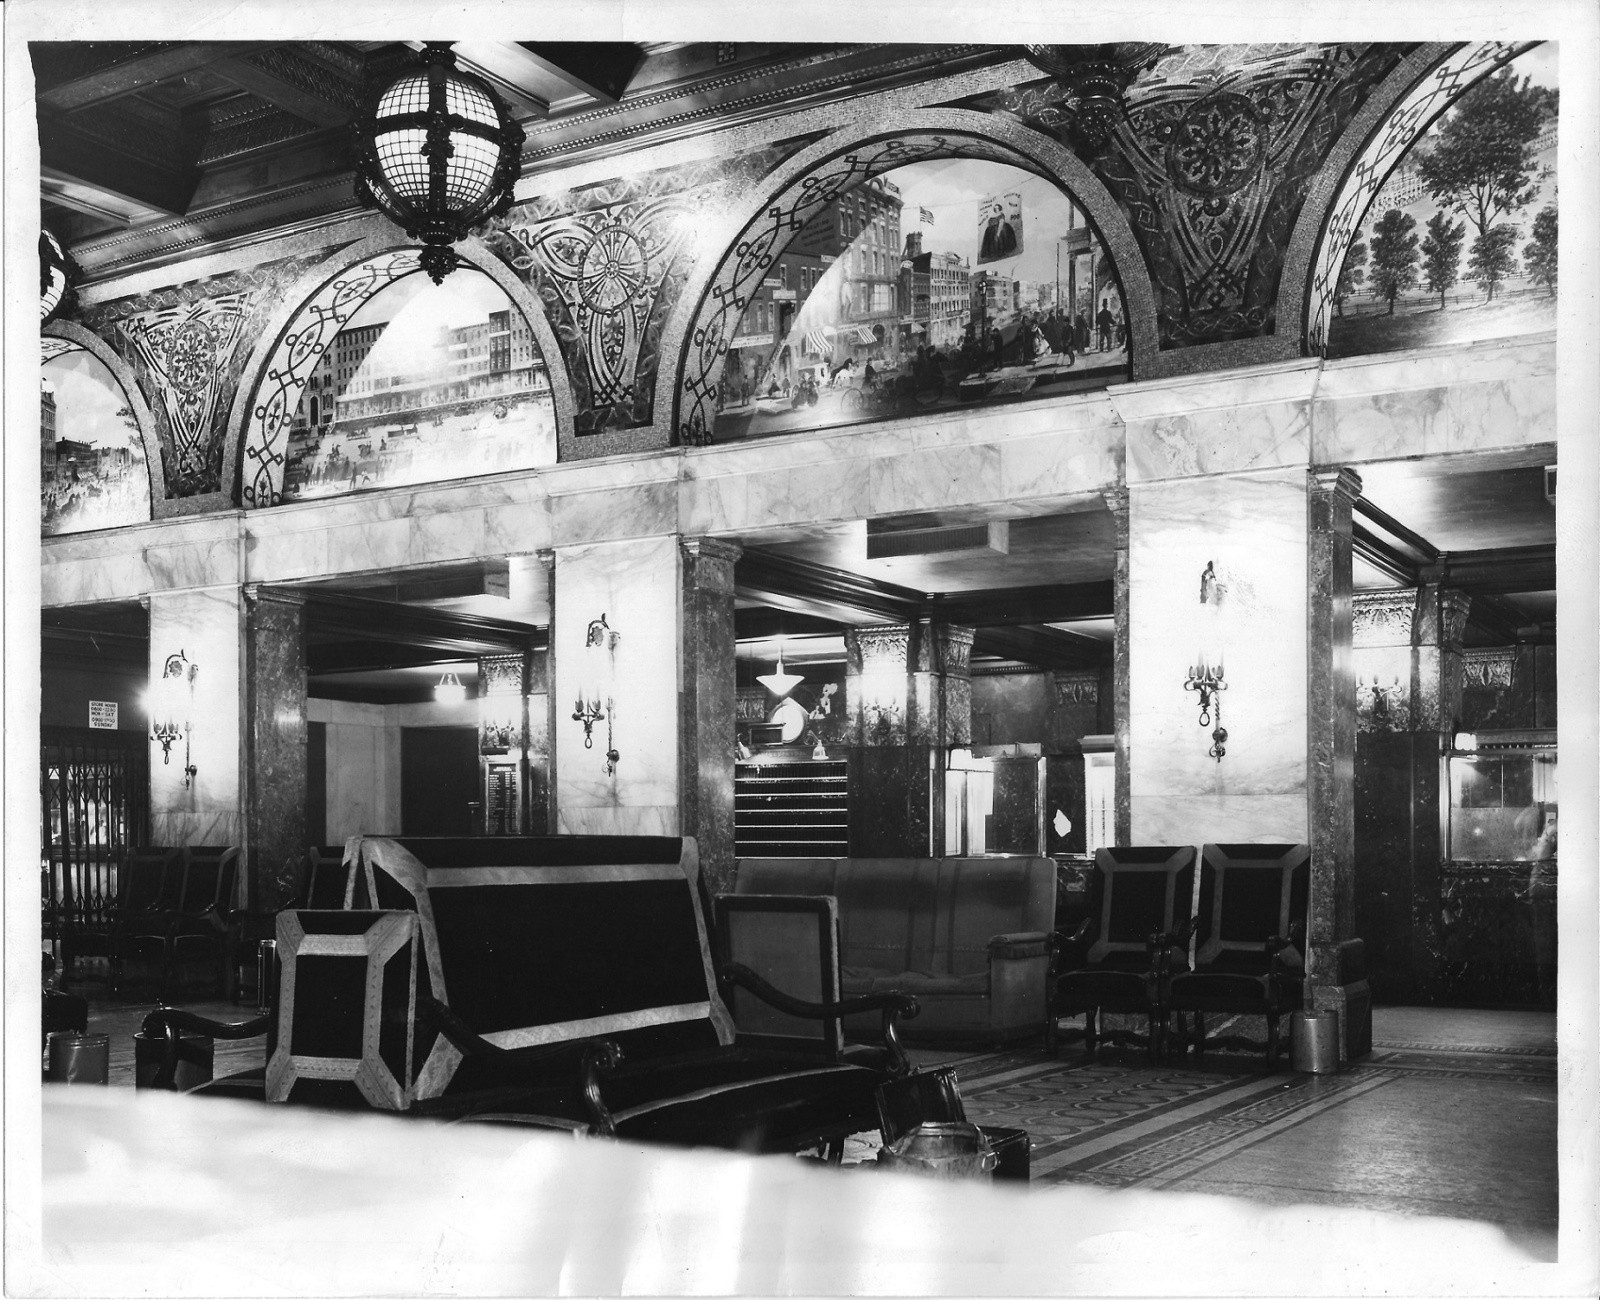 Congress Hotel Chicago